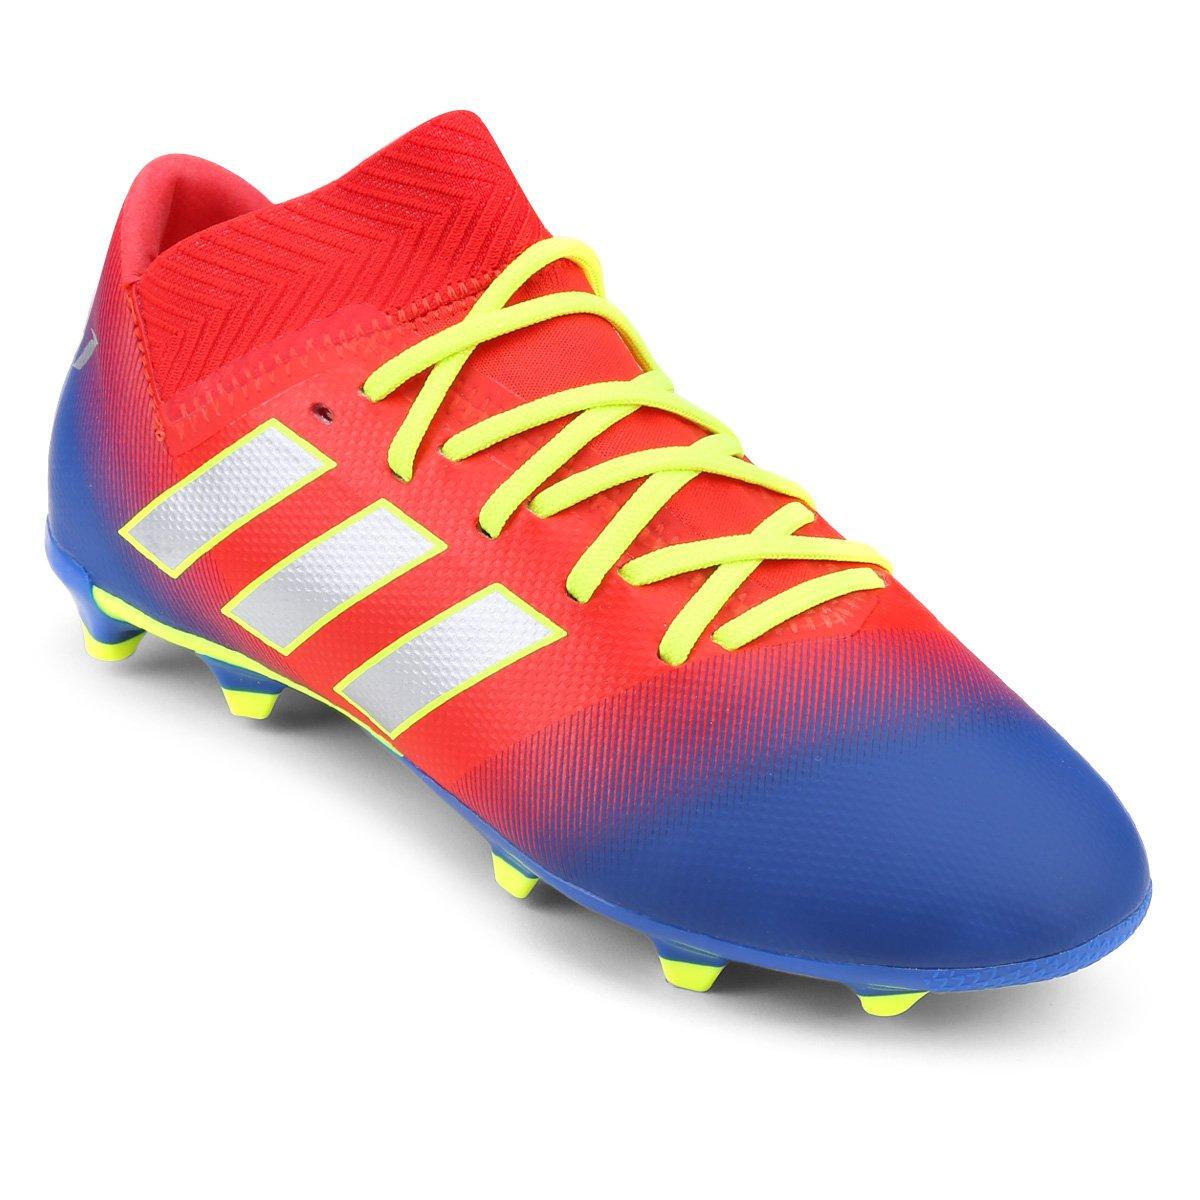 65969ecfe9 Chuteira Campo Infantil Adidas Nemeziz Messi 18 3 FG